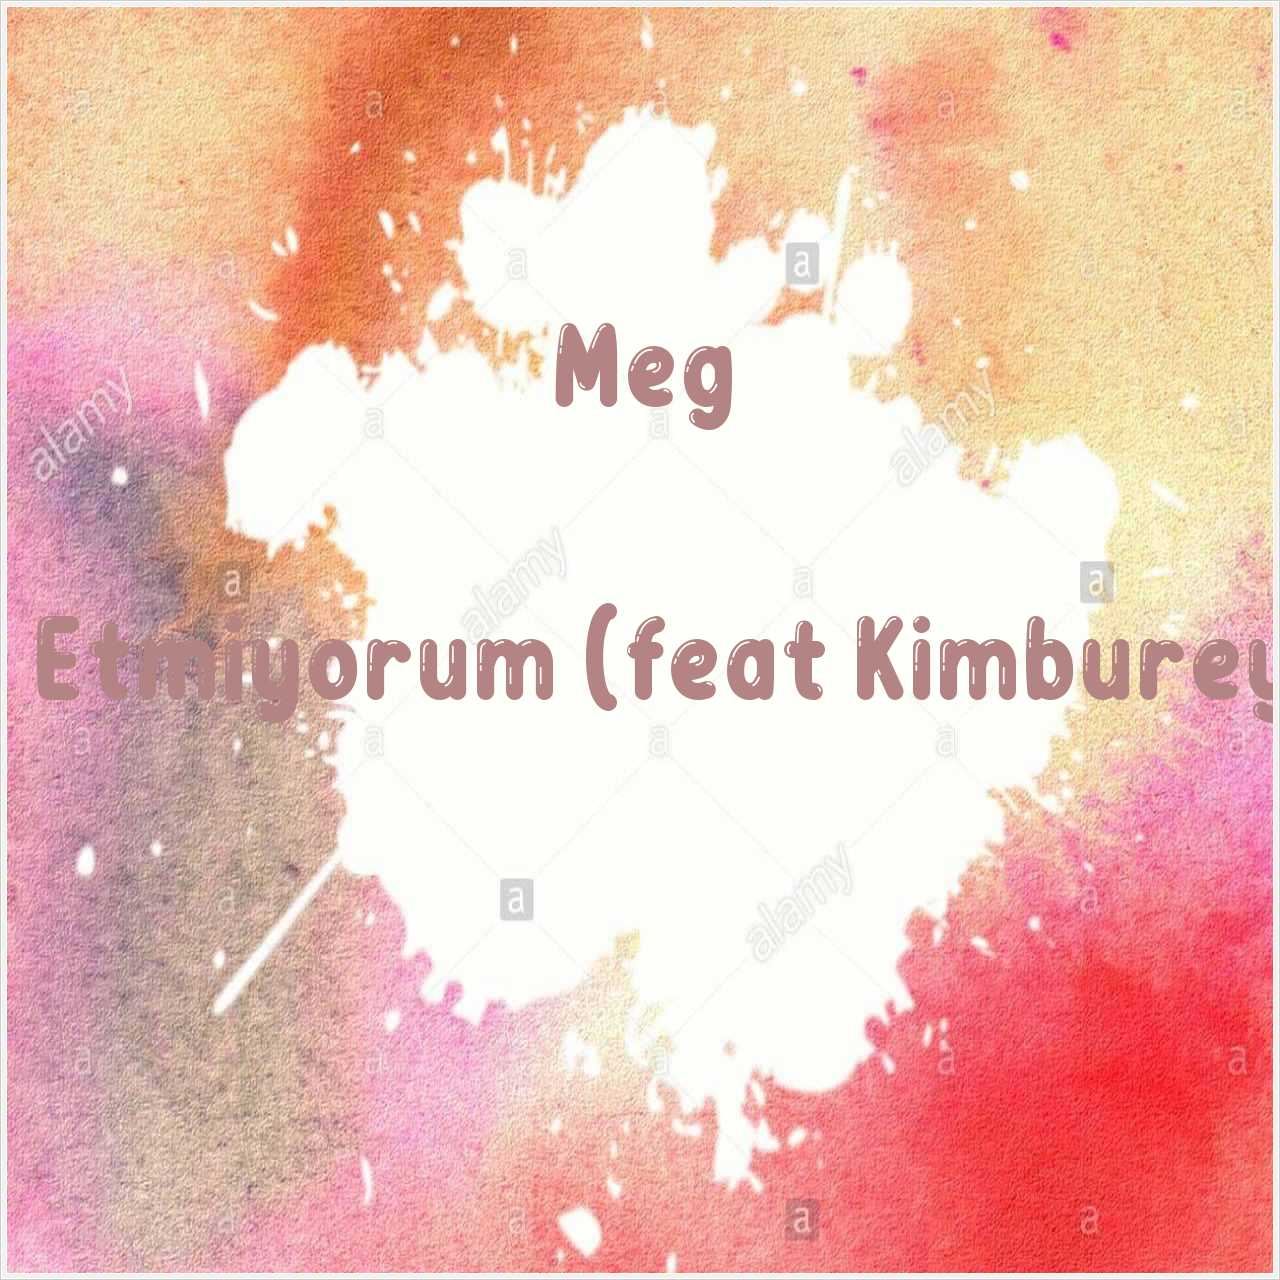 دانلود آهنگ جدید Meg به نام Helal Etmiyorum (feat Kimbureyhan)